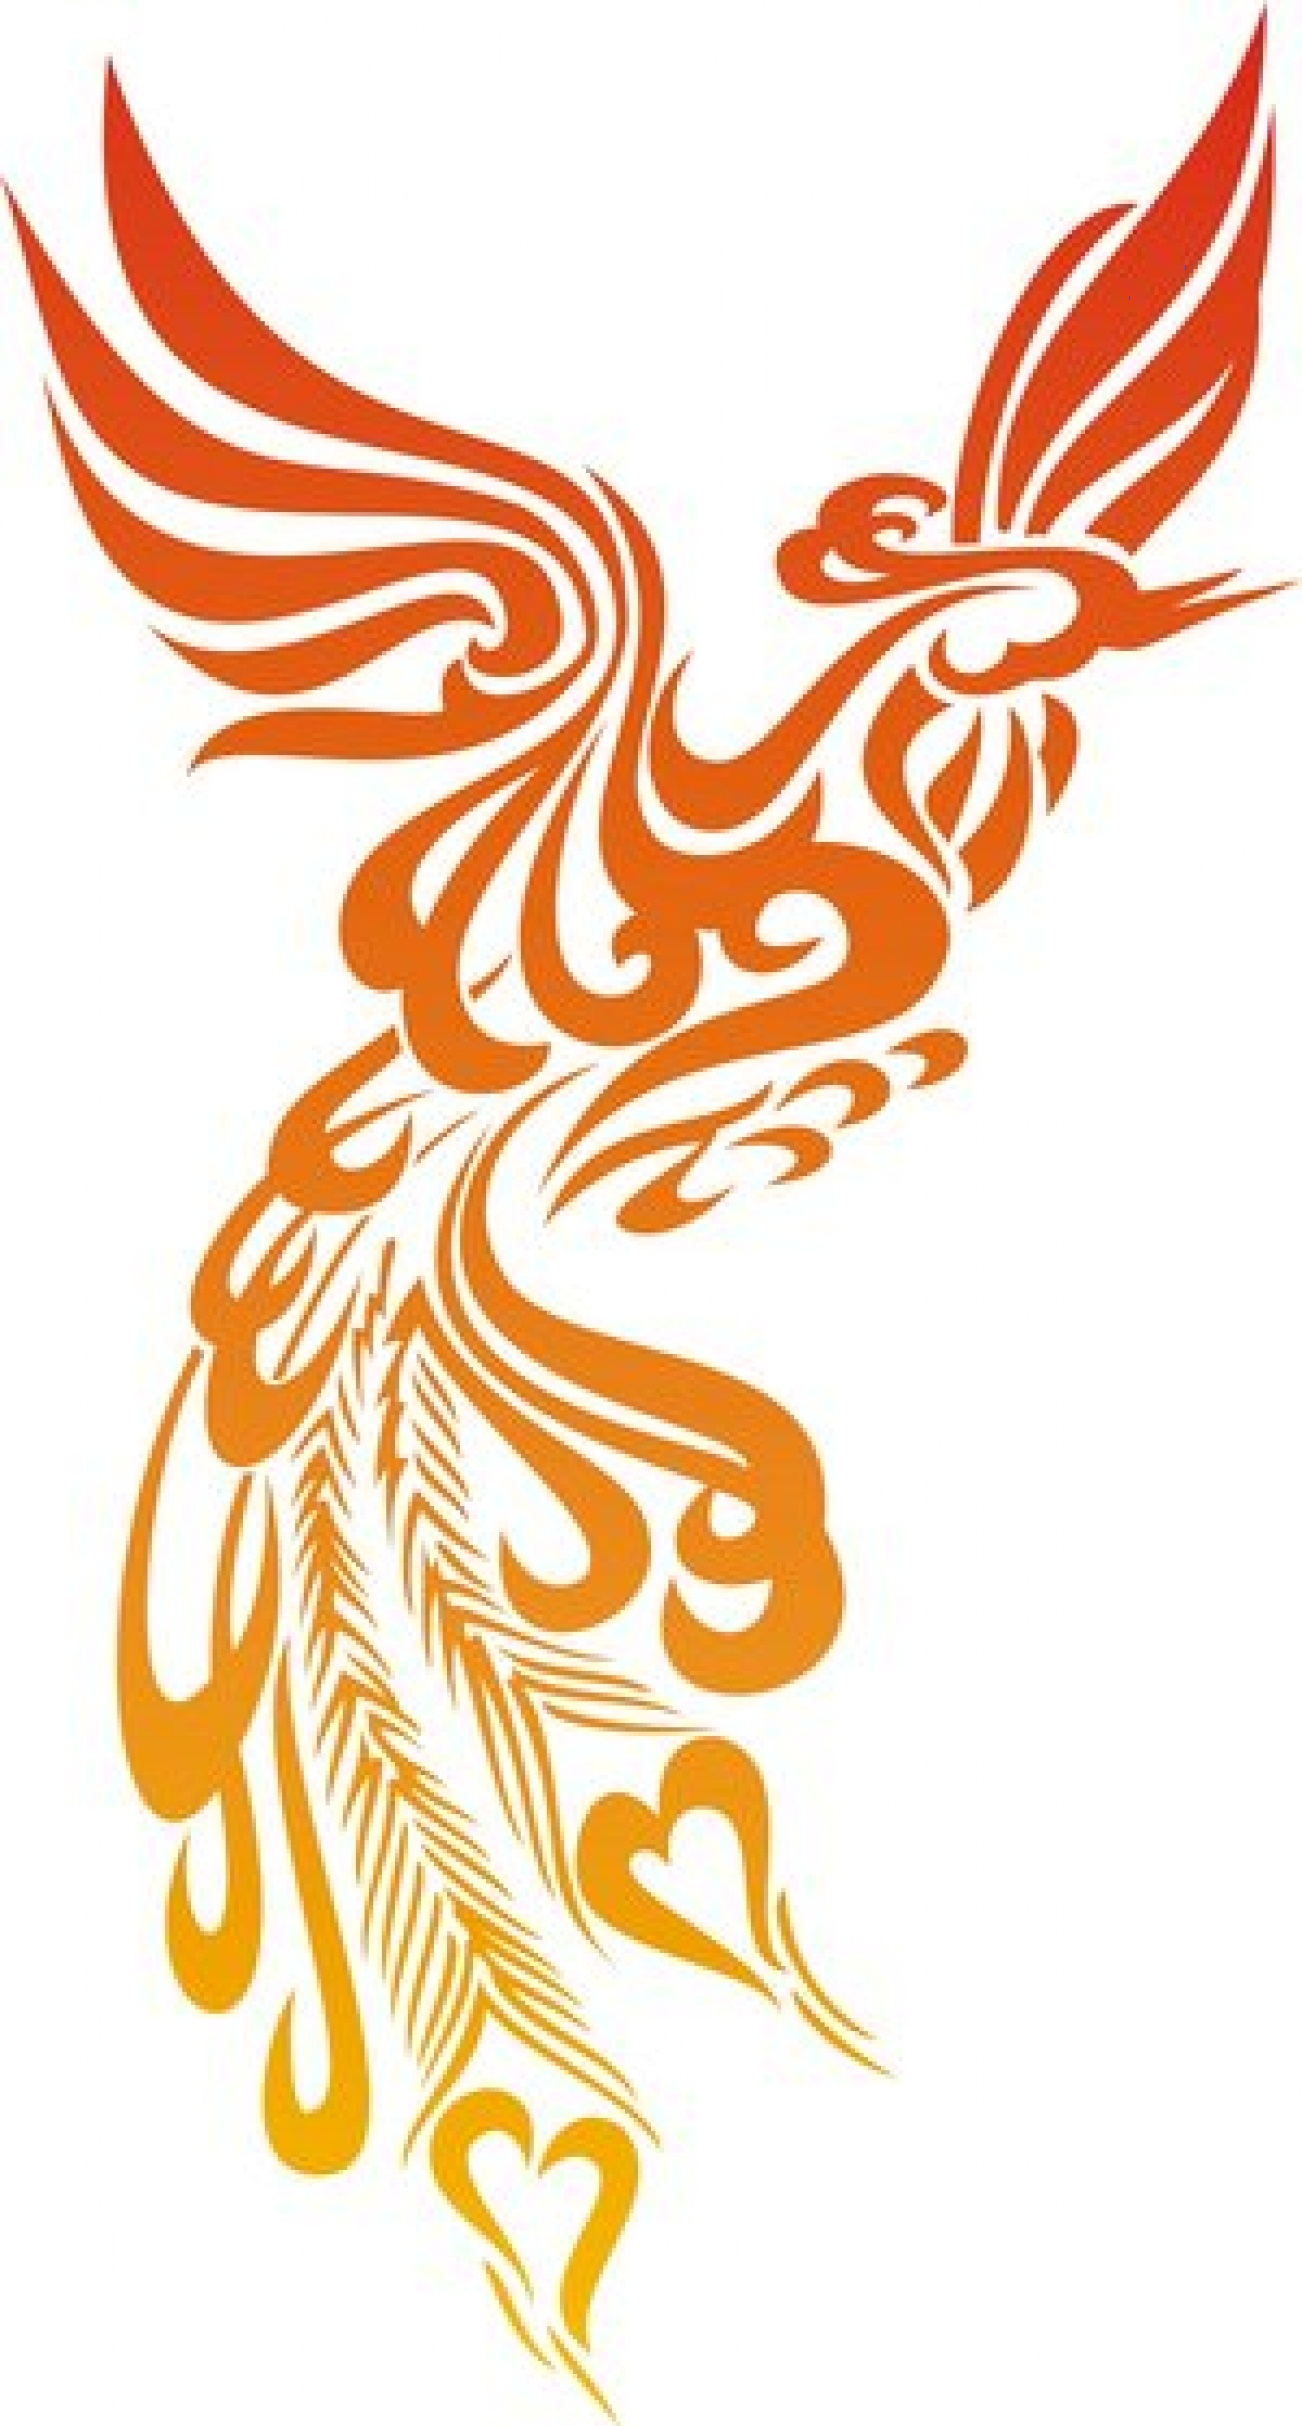 Phoenix clipart #15, Download drawings